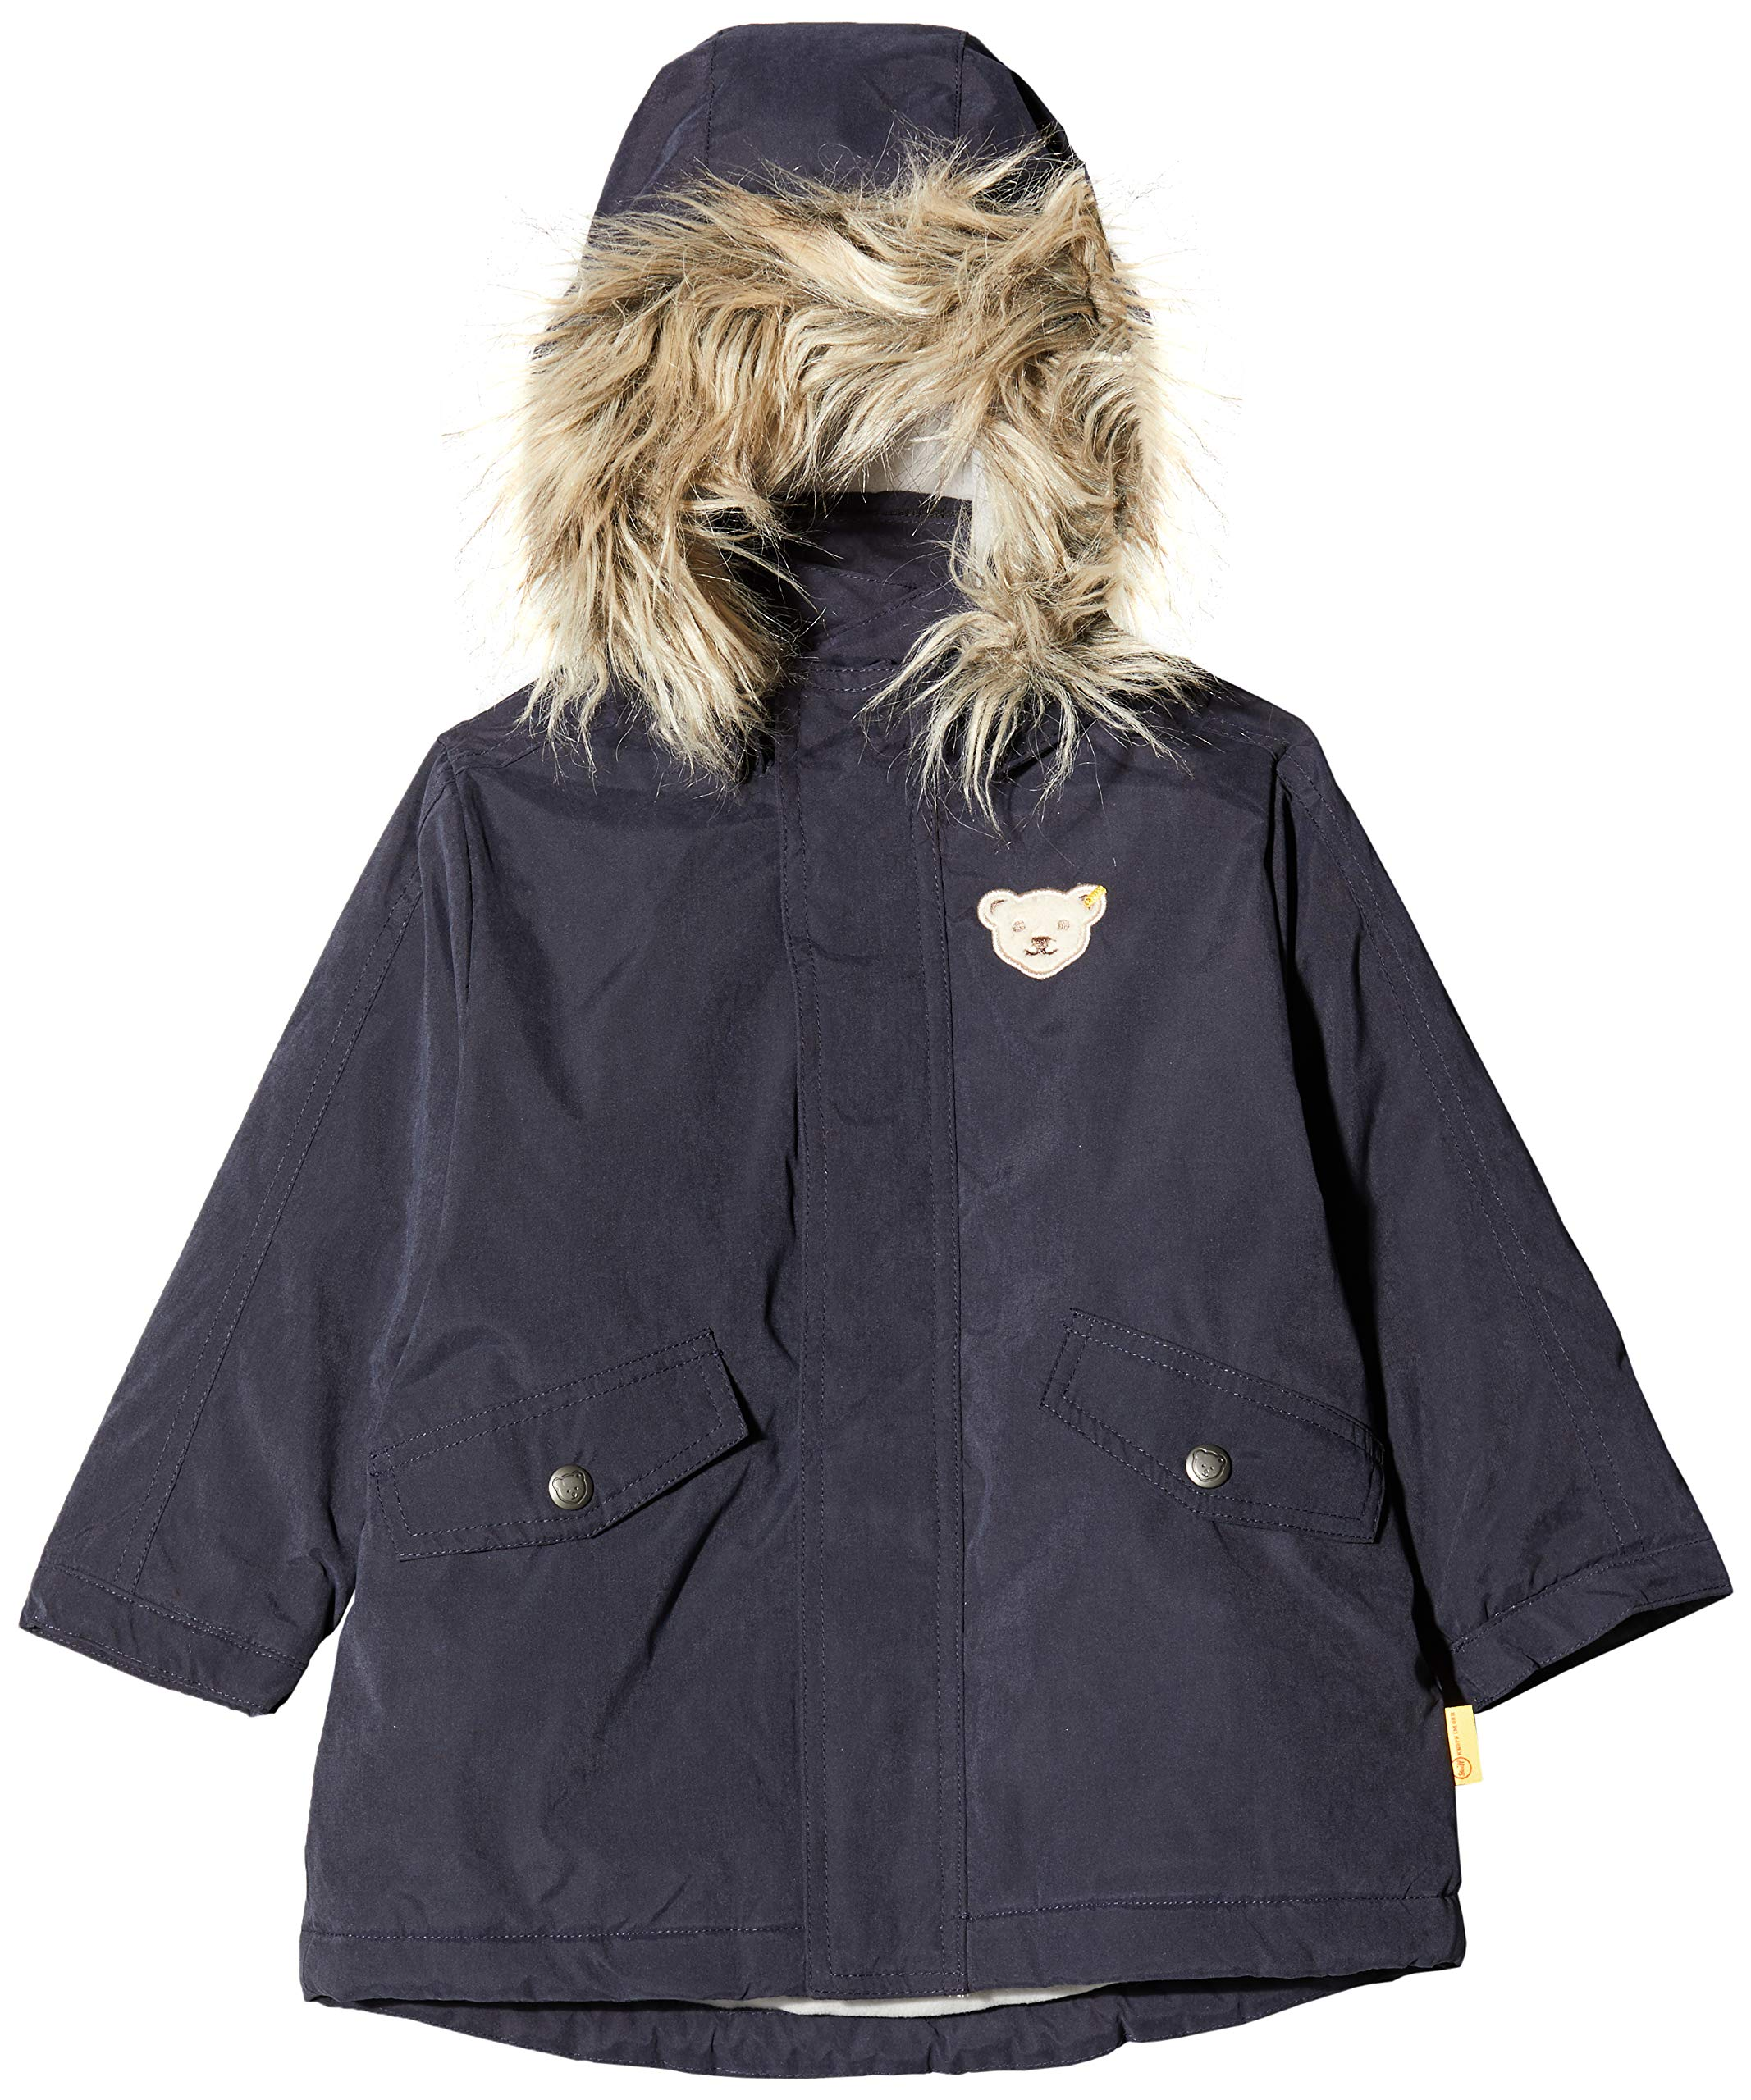 Steiff Jacket Chaqueta para Bebés 1